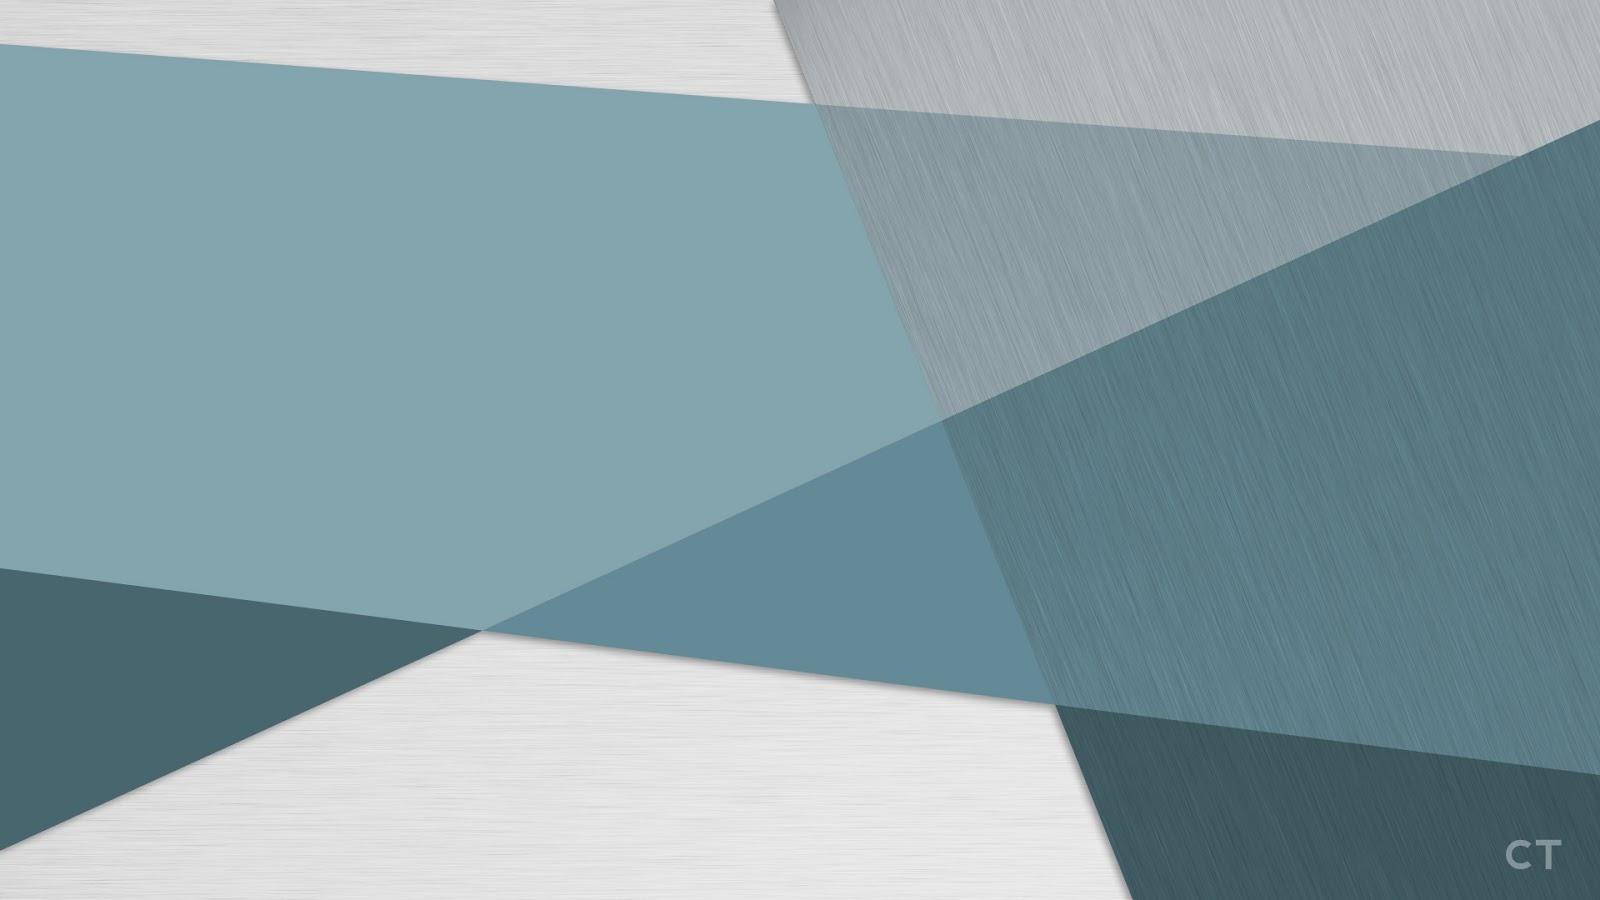 Geometric Pattern Desktop Wallpaper Geometric patterns desktop 1600x900